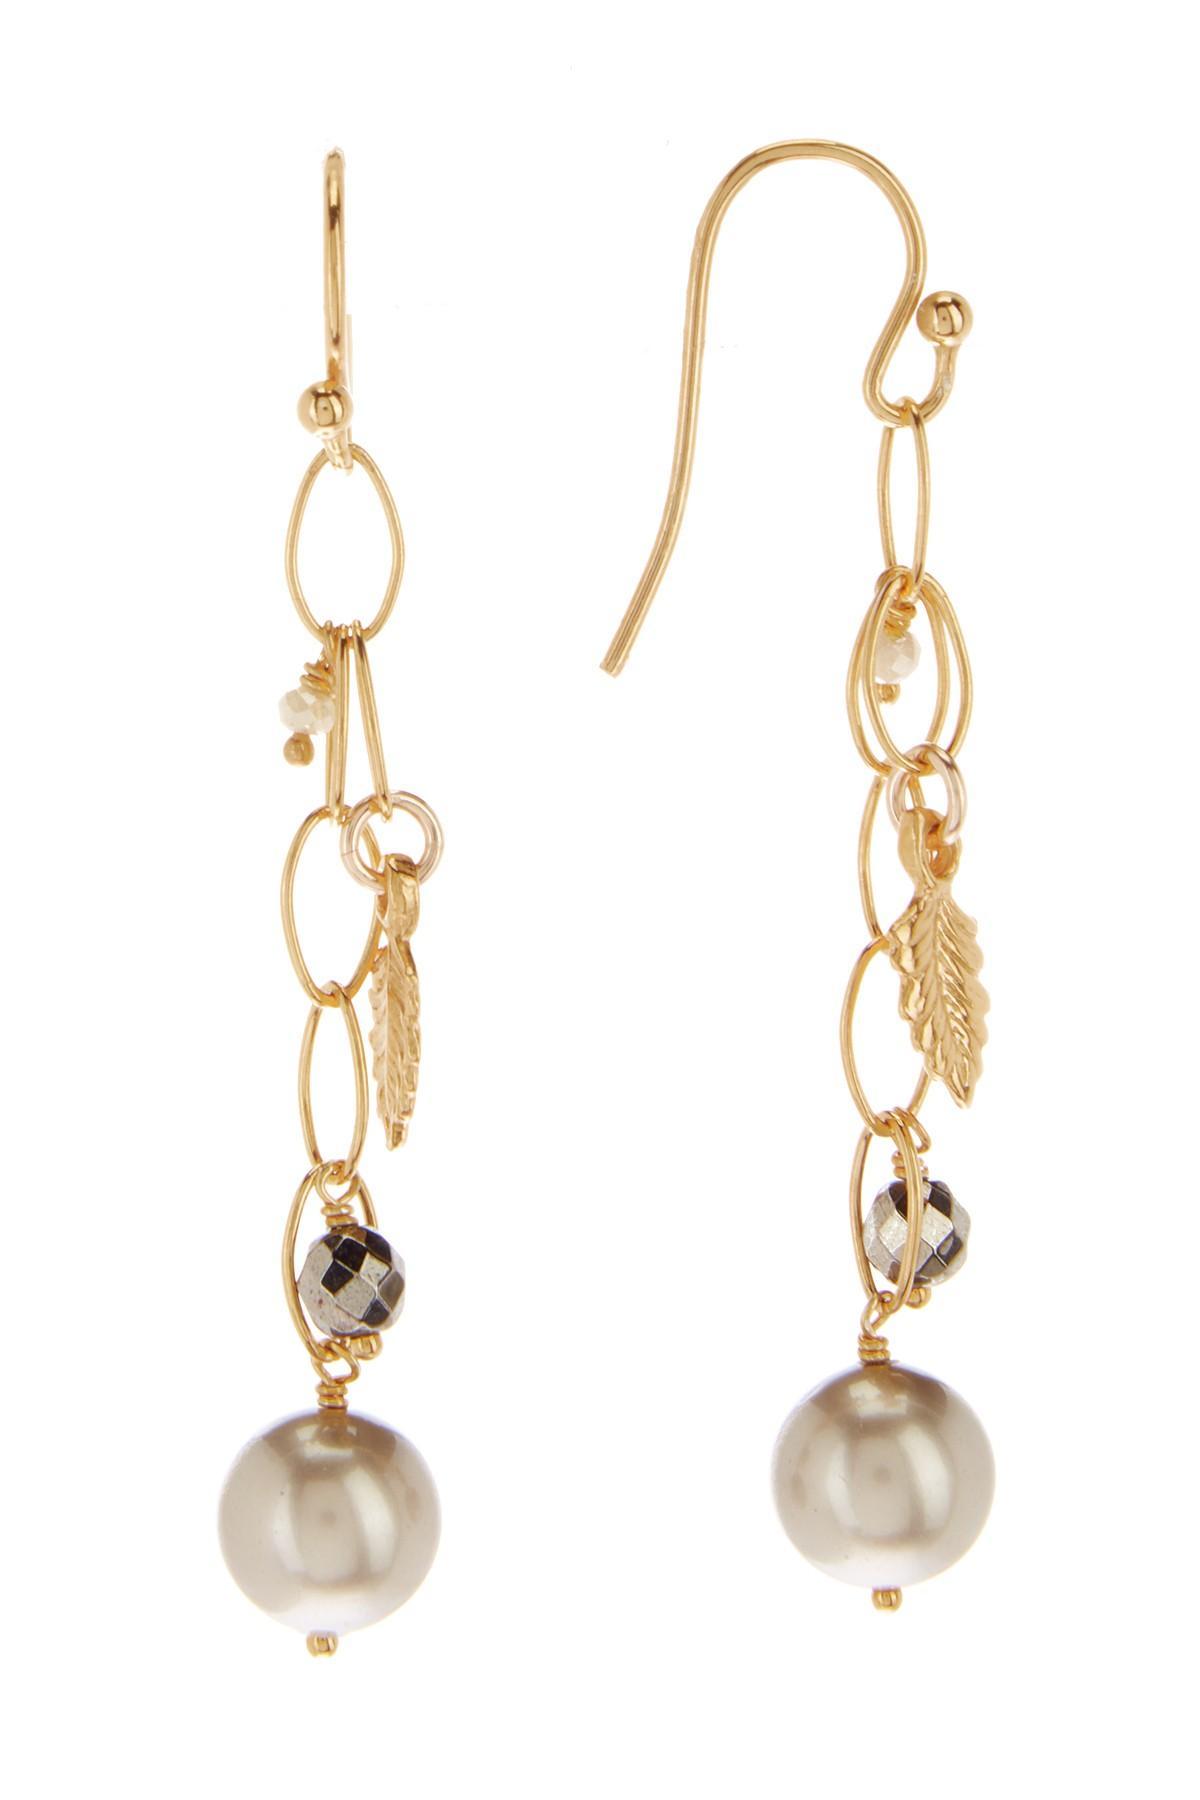 3590955b6 Chan Luu. Women's Metallic 18k Yellow Gold Plated Sterling Silver Chain  Drop Swarovski Pearl Accented Earrings